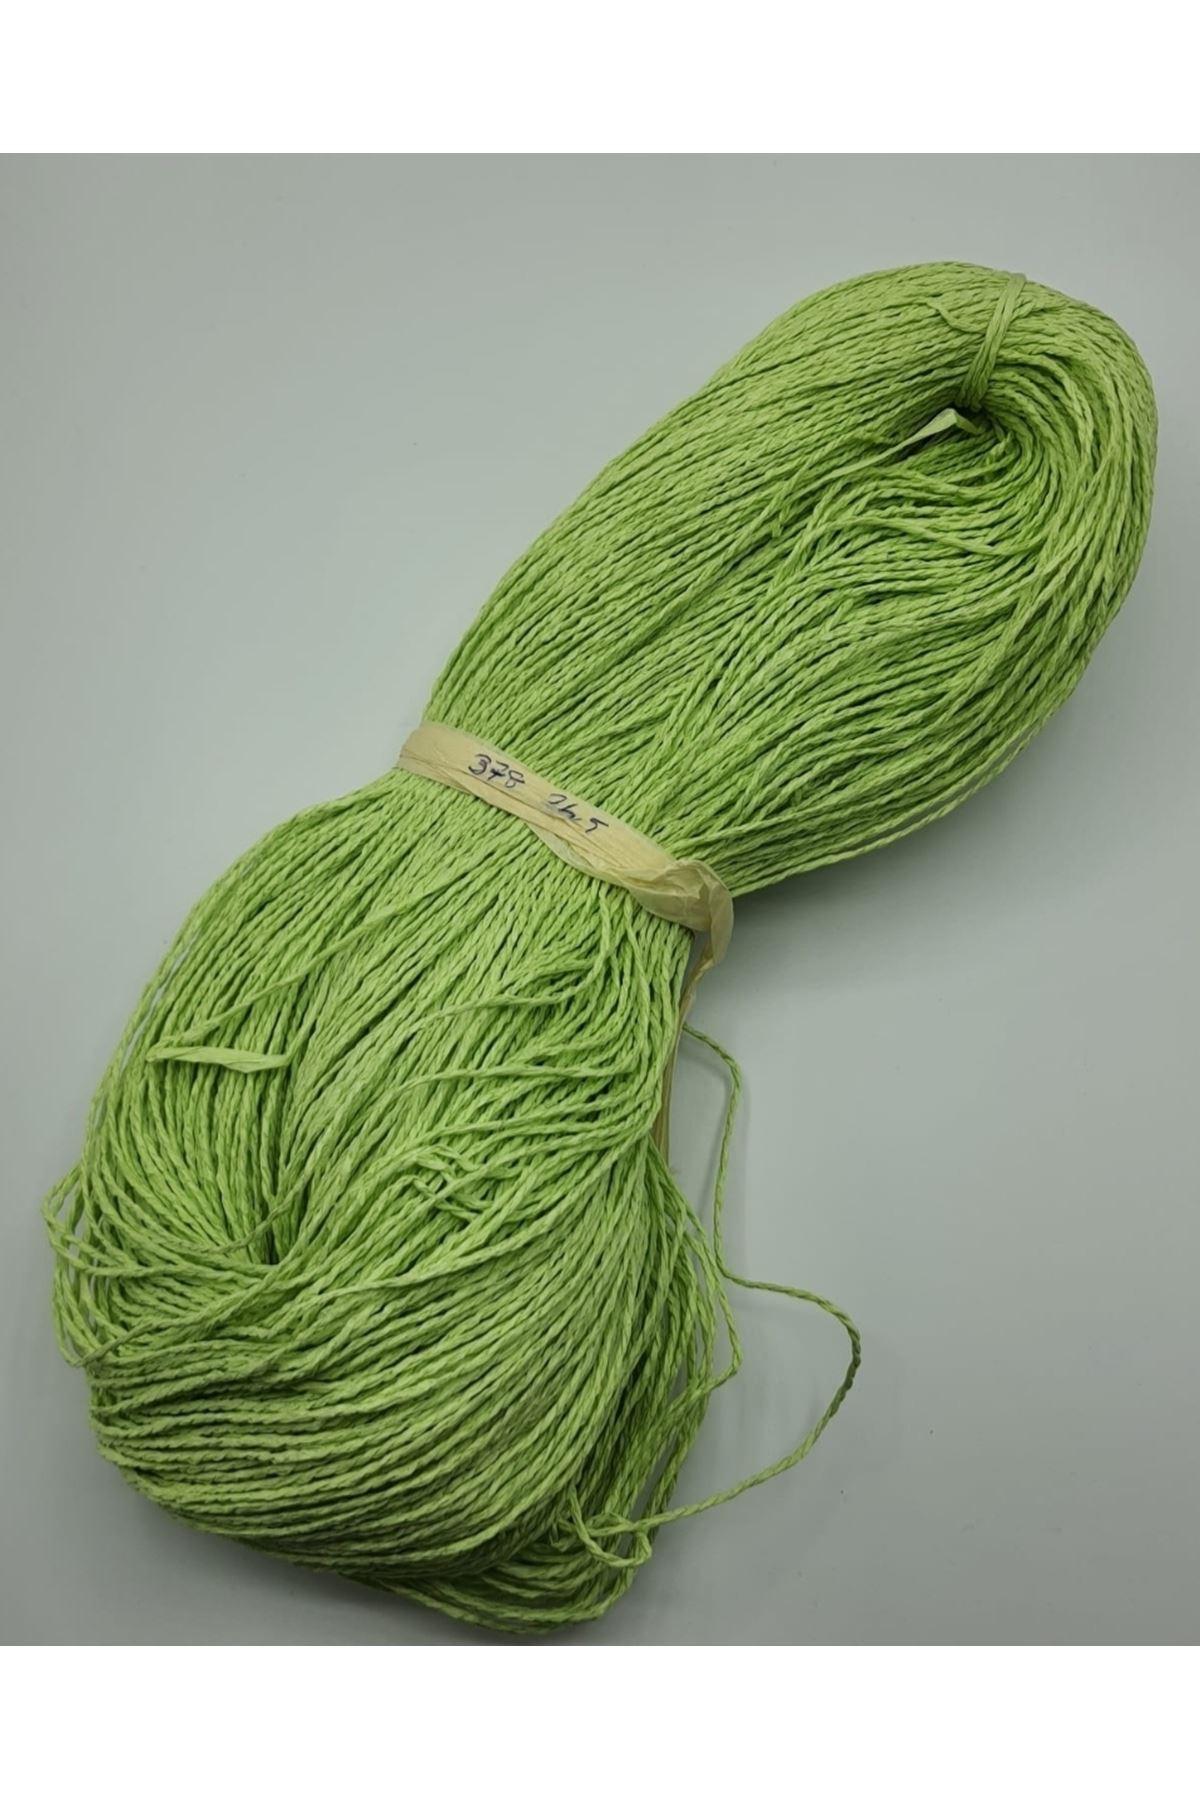 Kağıt İp Açık Yeşil 410 gram